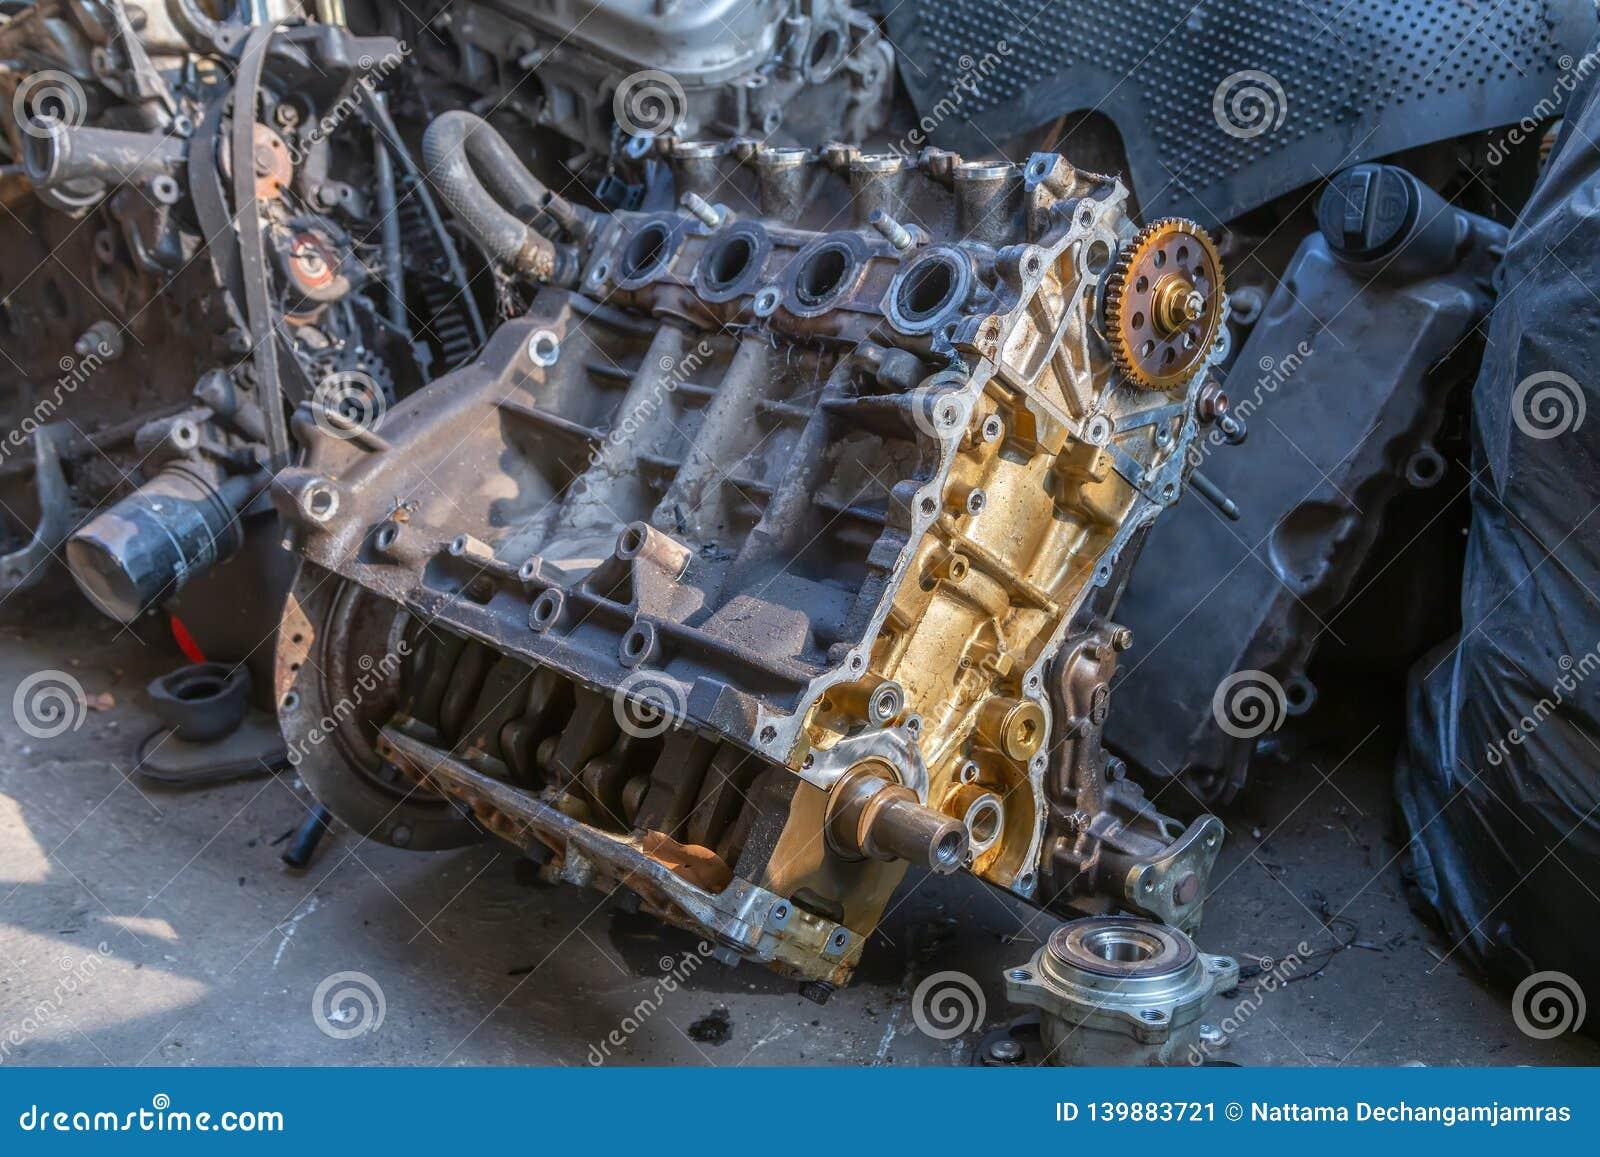 Used Car Engines >> Used Engines Auto Mechanic Repairing Car Stock Image